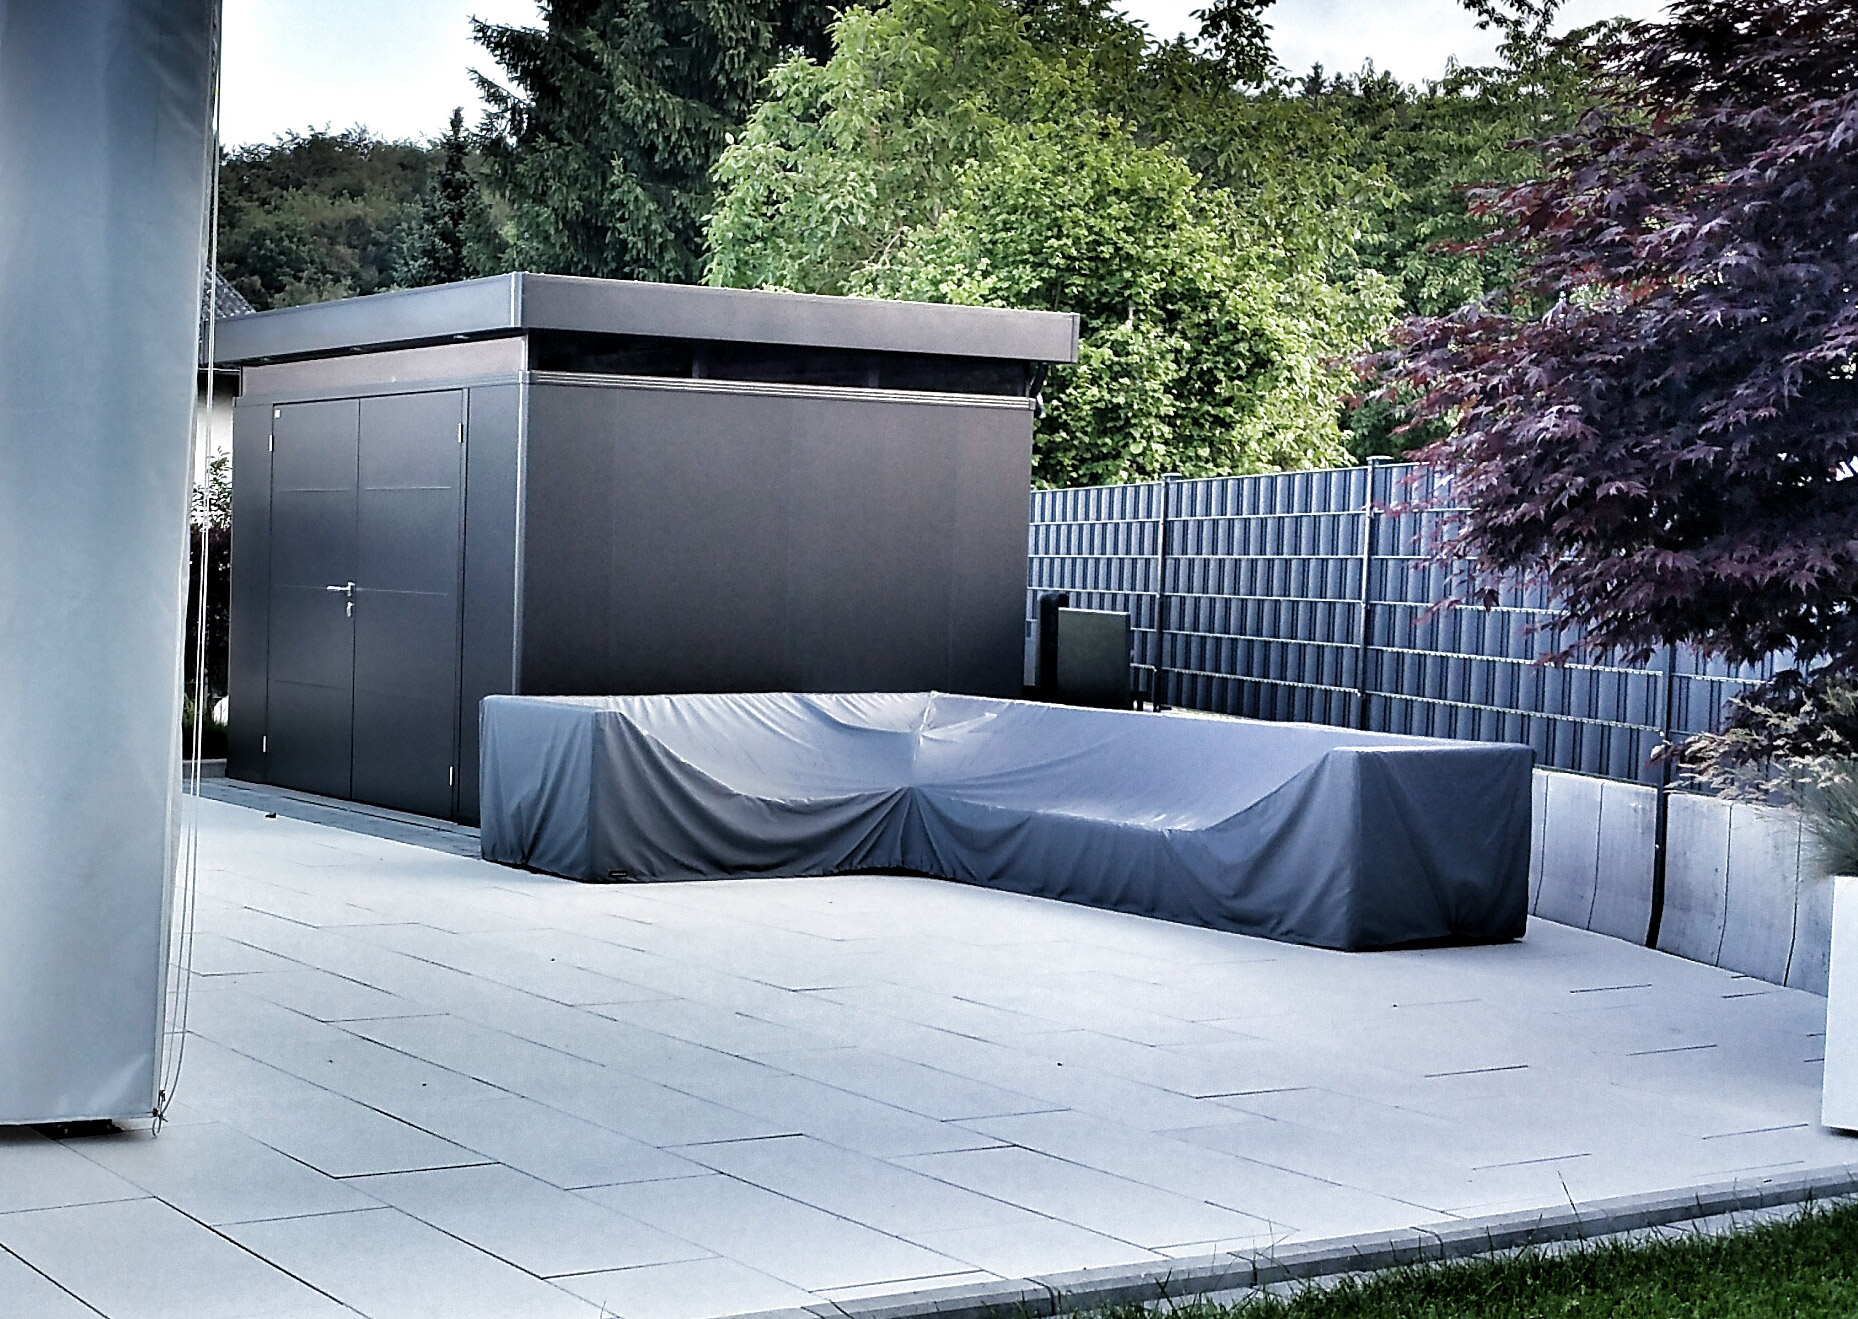 loungeabdeckung referenz atmungsaktiv gartenm bel abdeckung. Black Bedroom Furniture Sets. Home Design Ideas